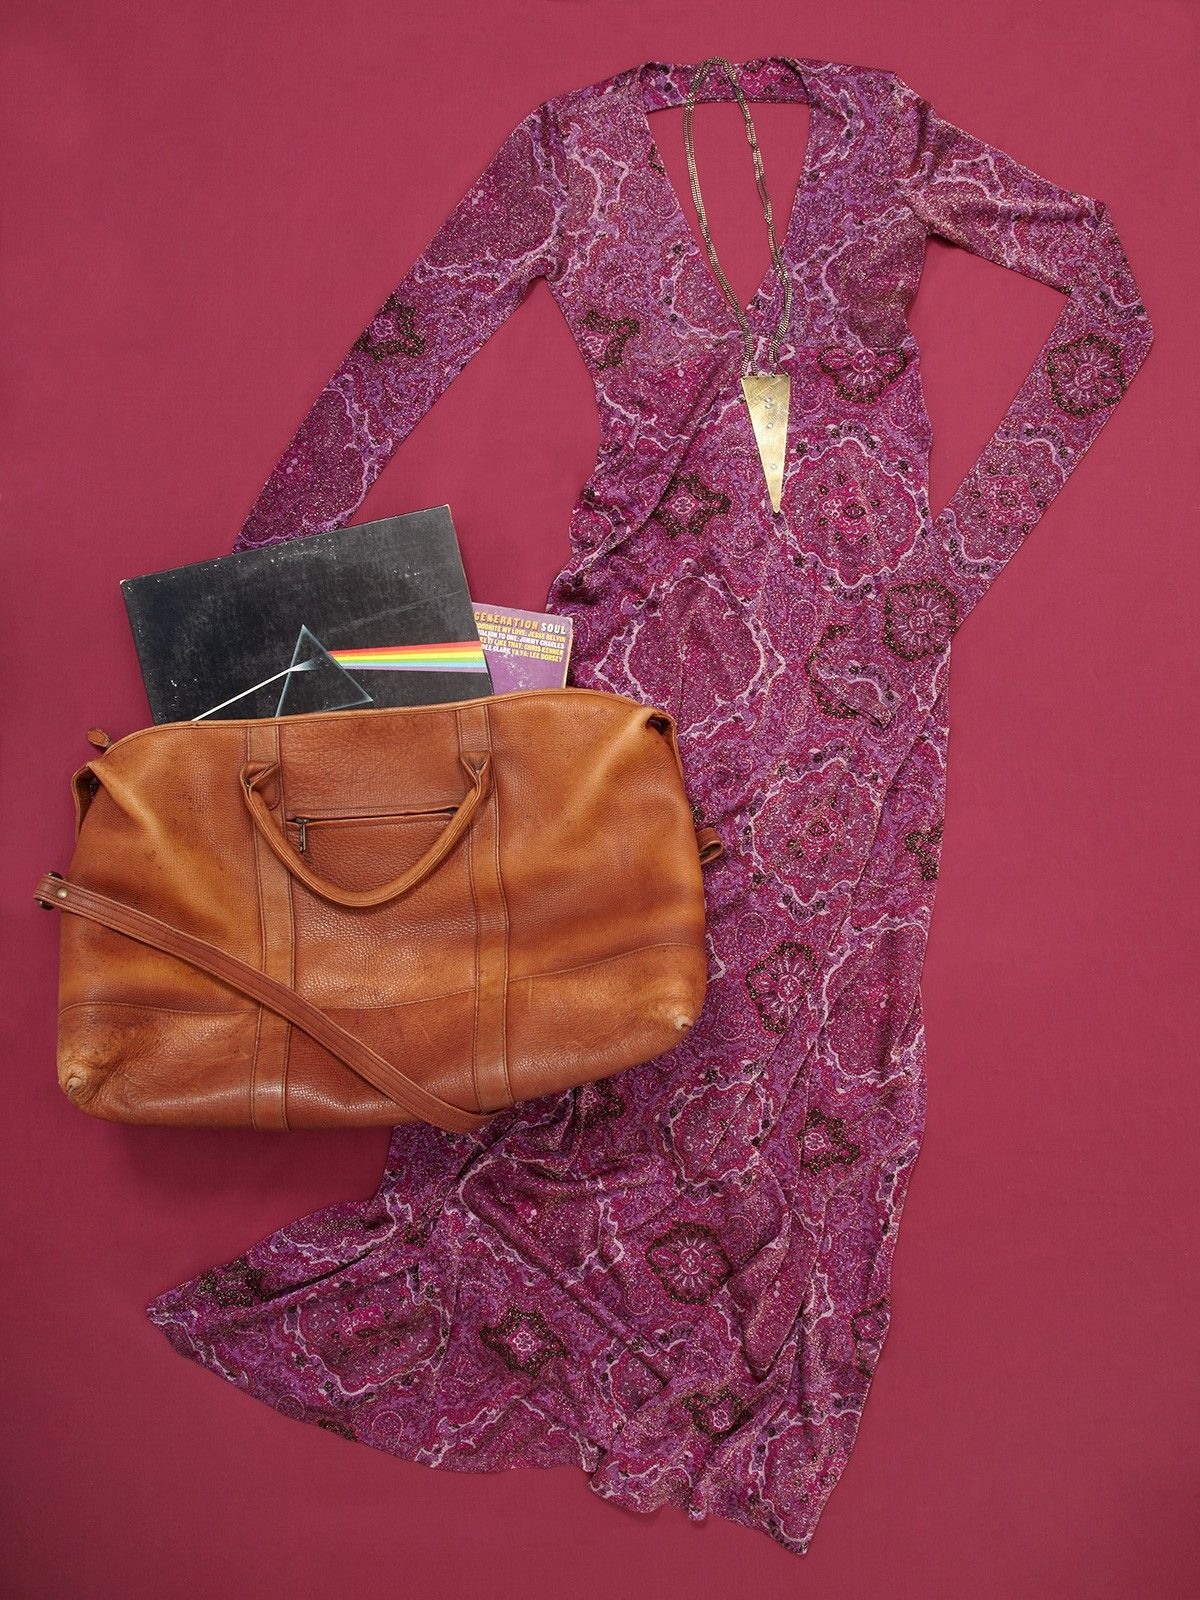 Spanish Moss Hemingway leather valise overnight bag